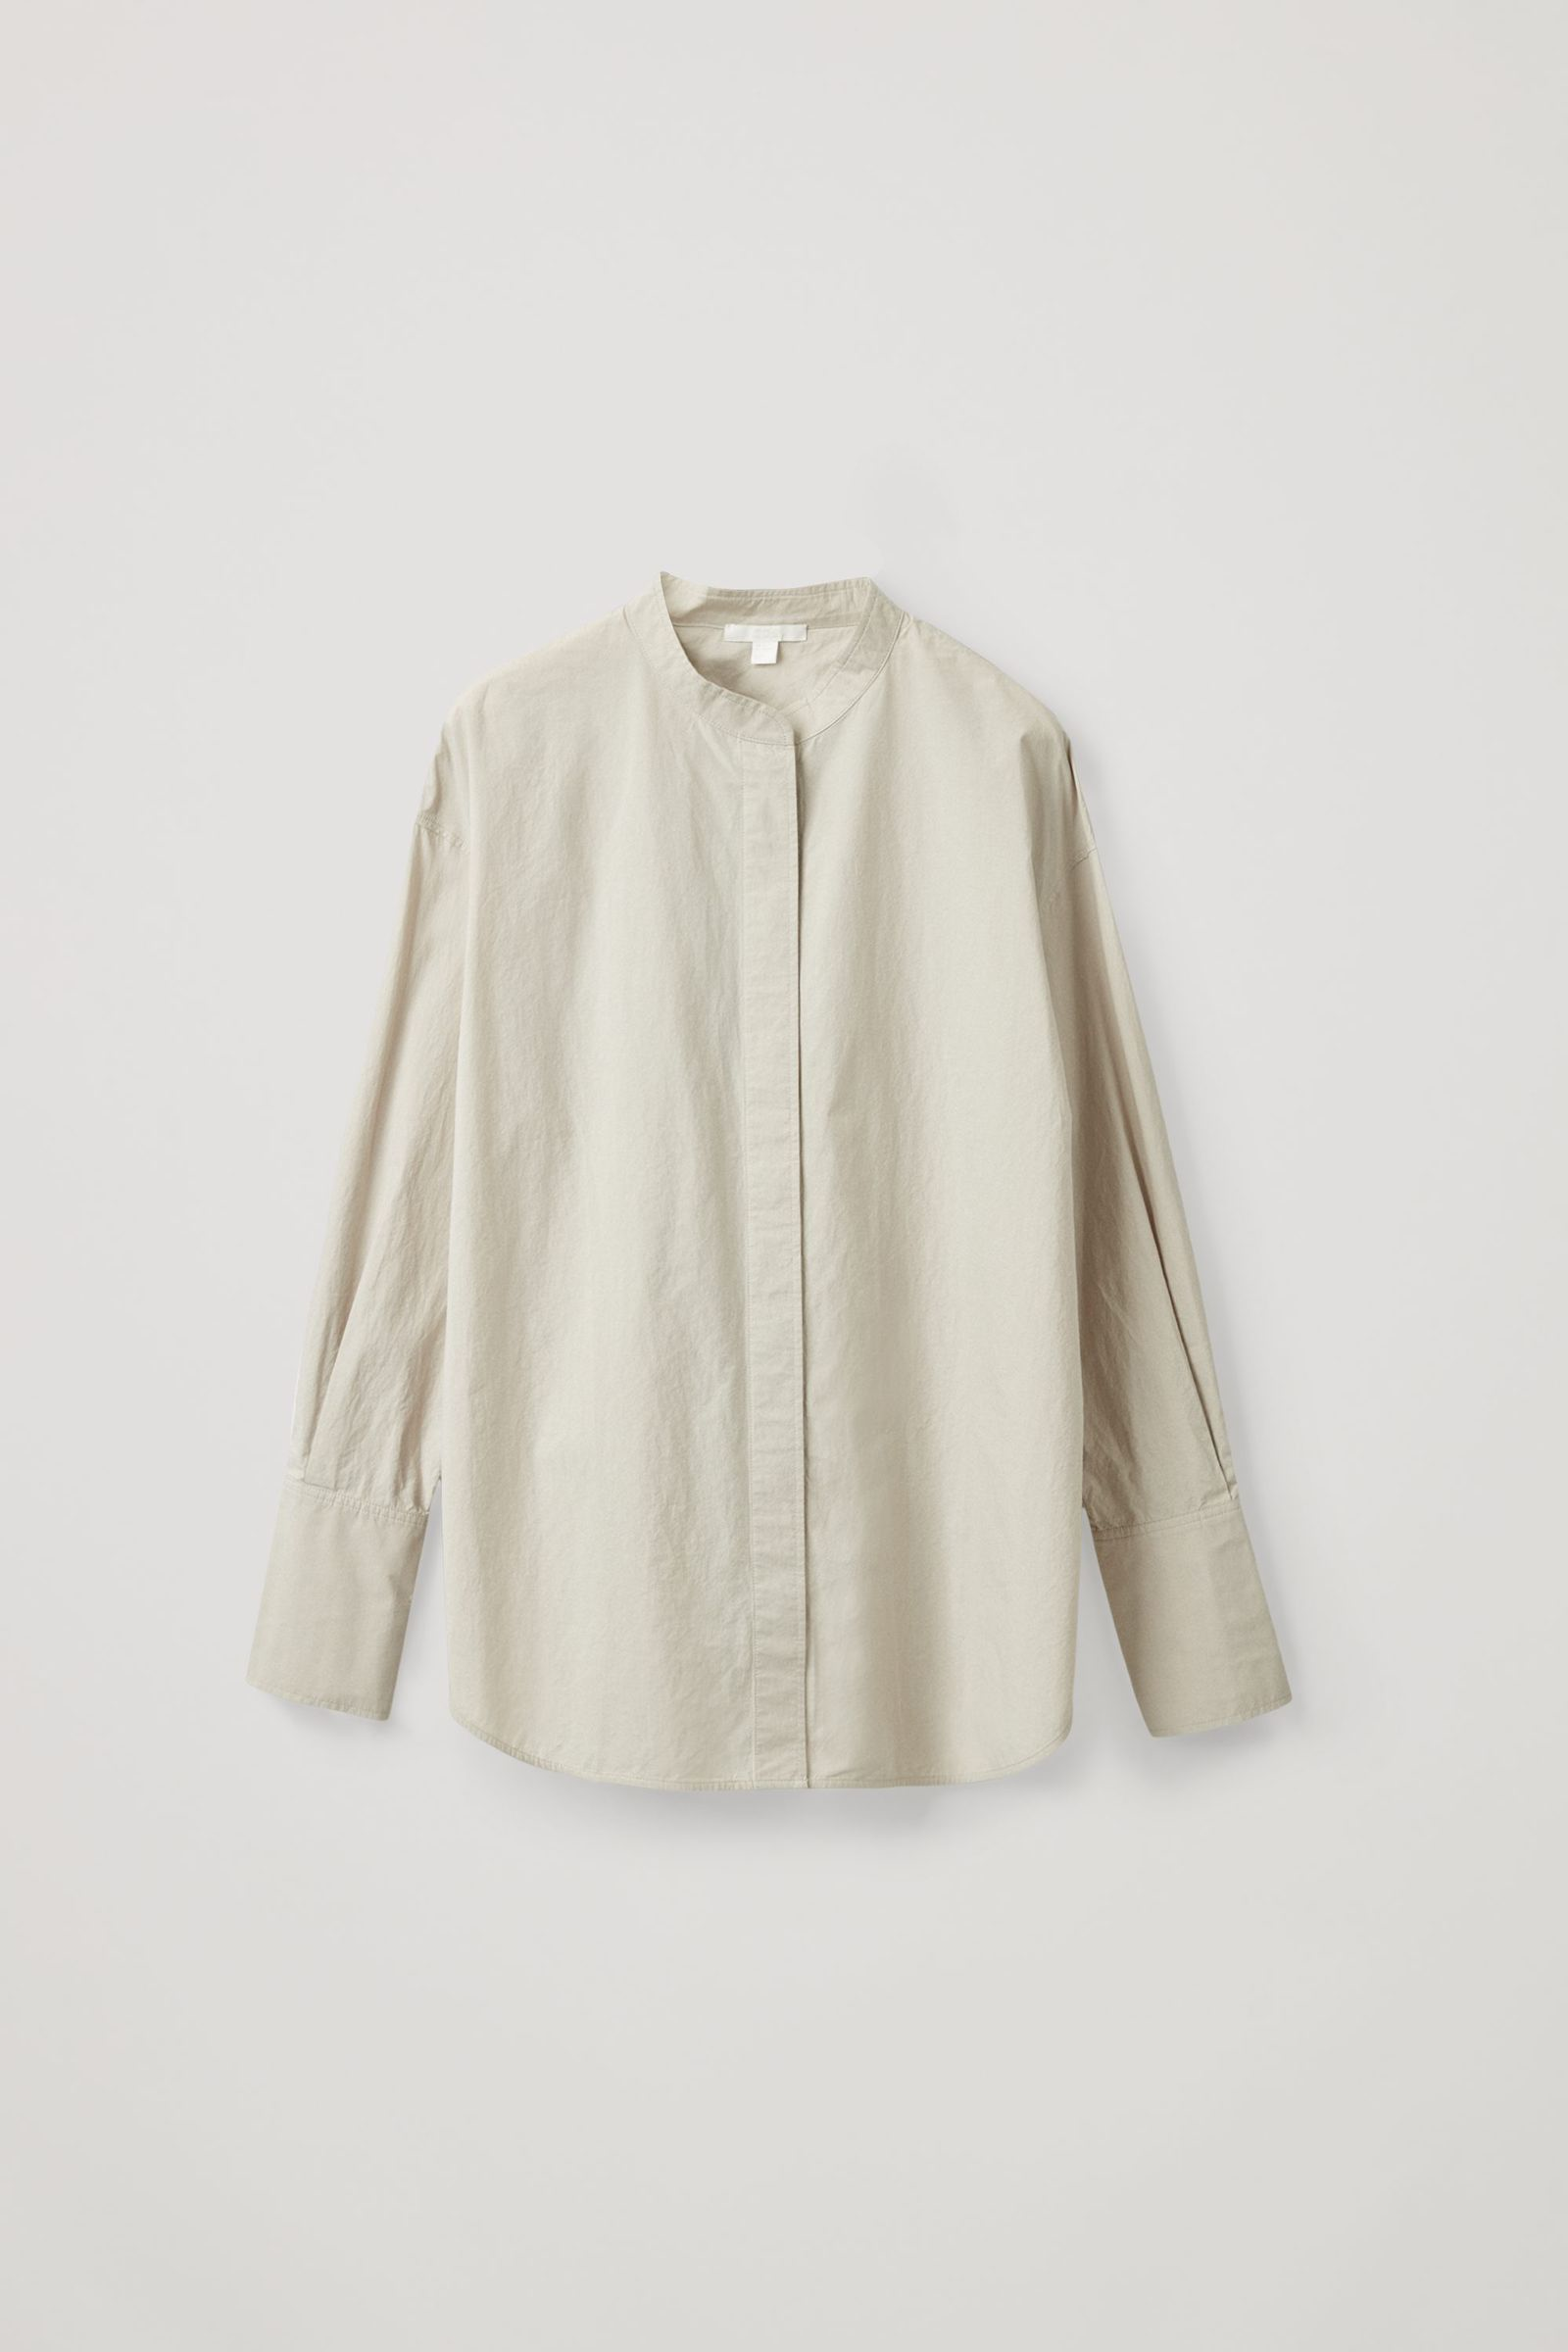 COS 오버사이즈 코튼 보이프렌드 셔츠의 몰 그레이컬러 Product입니다.